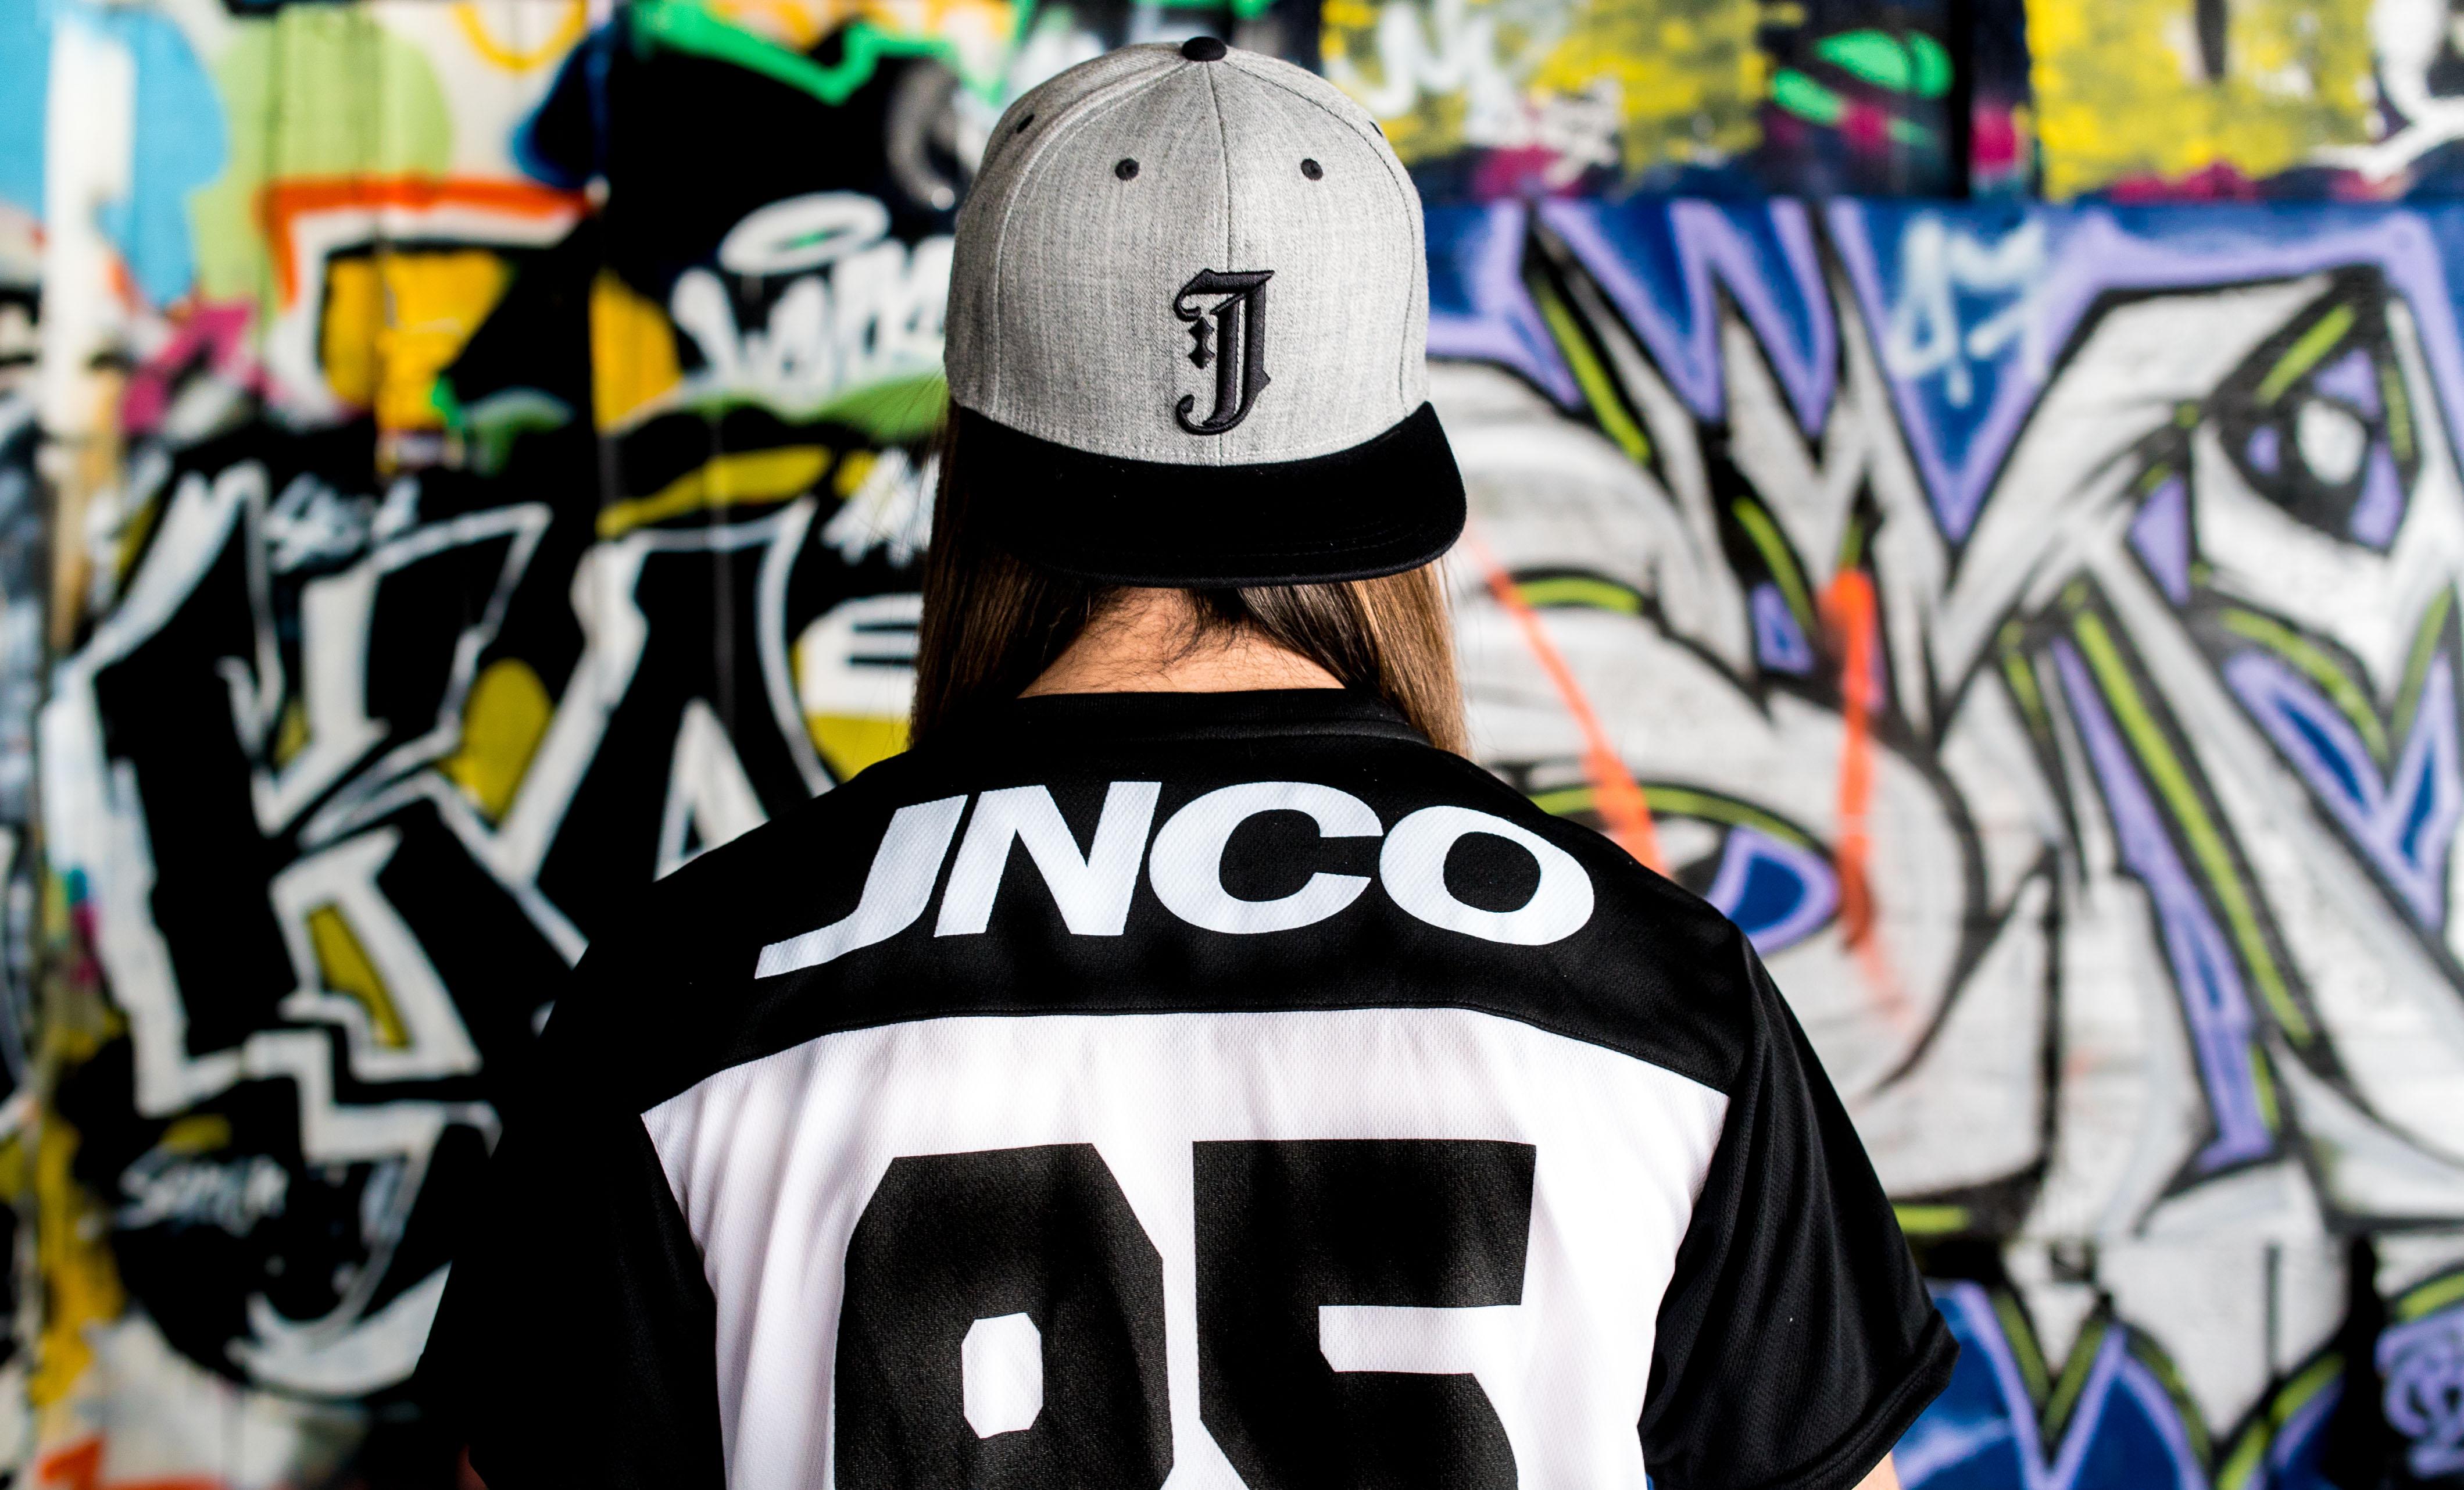 JNCO Samples-5